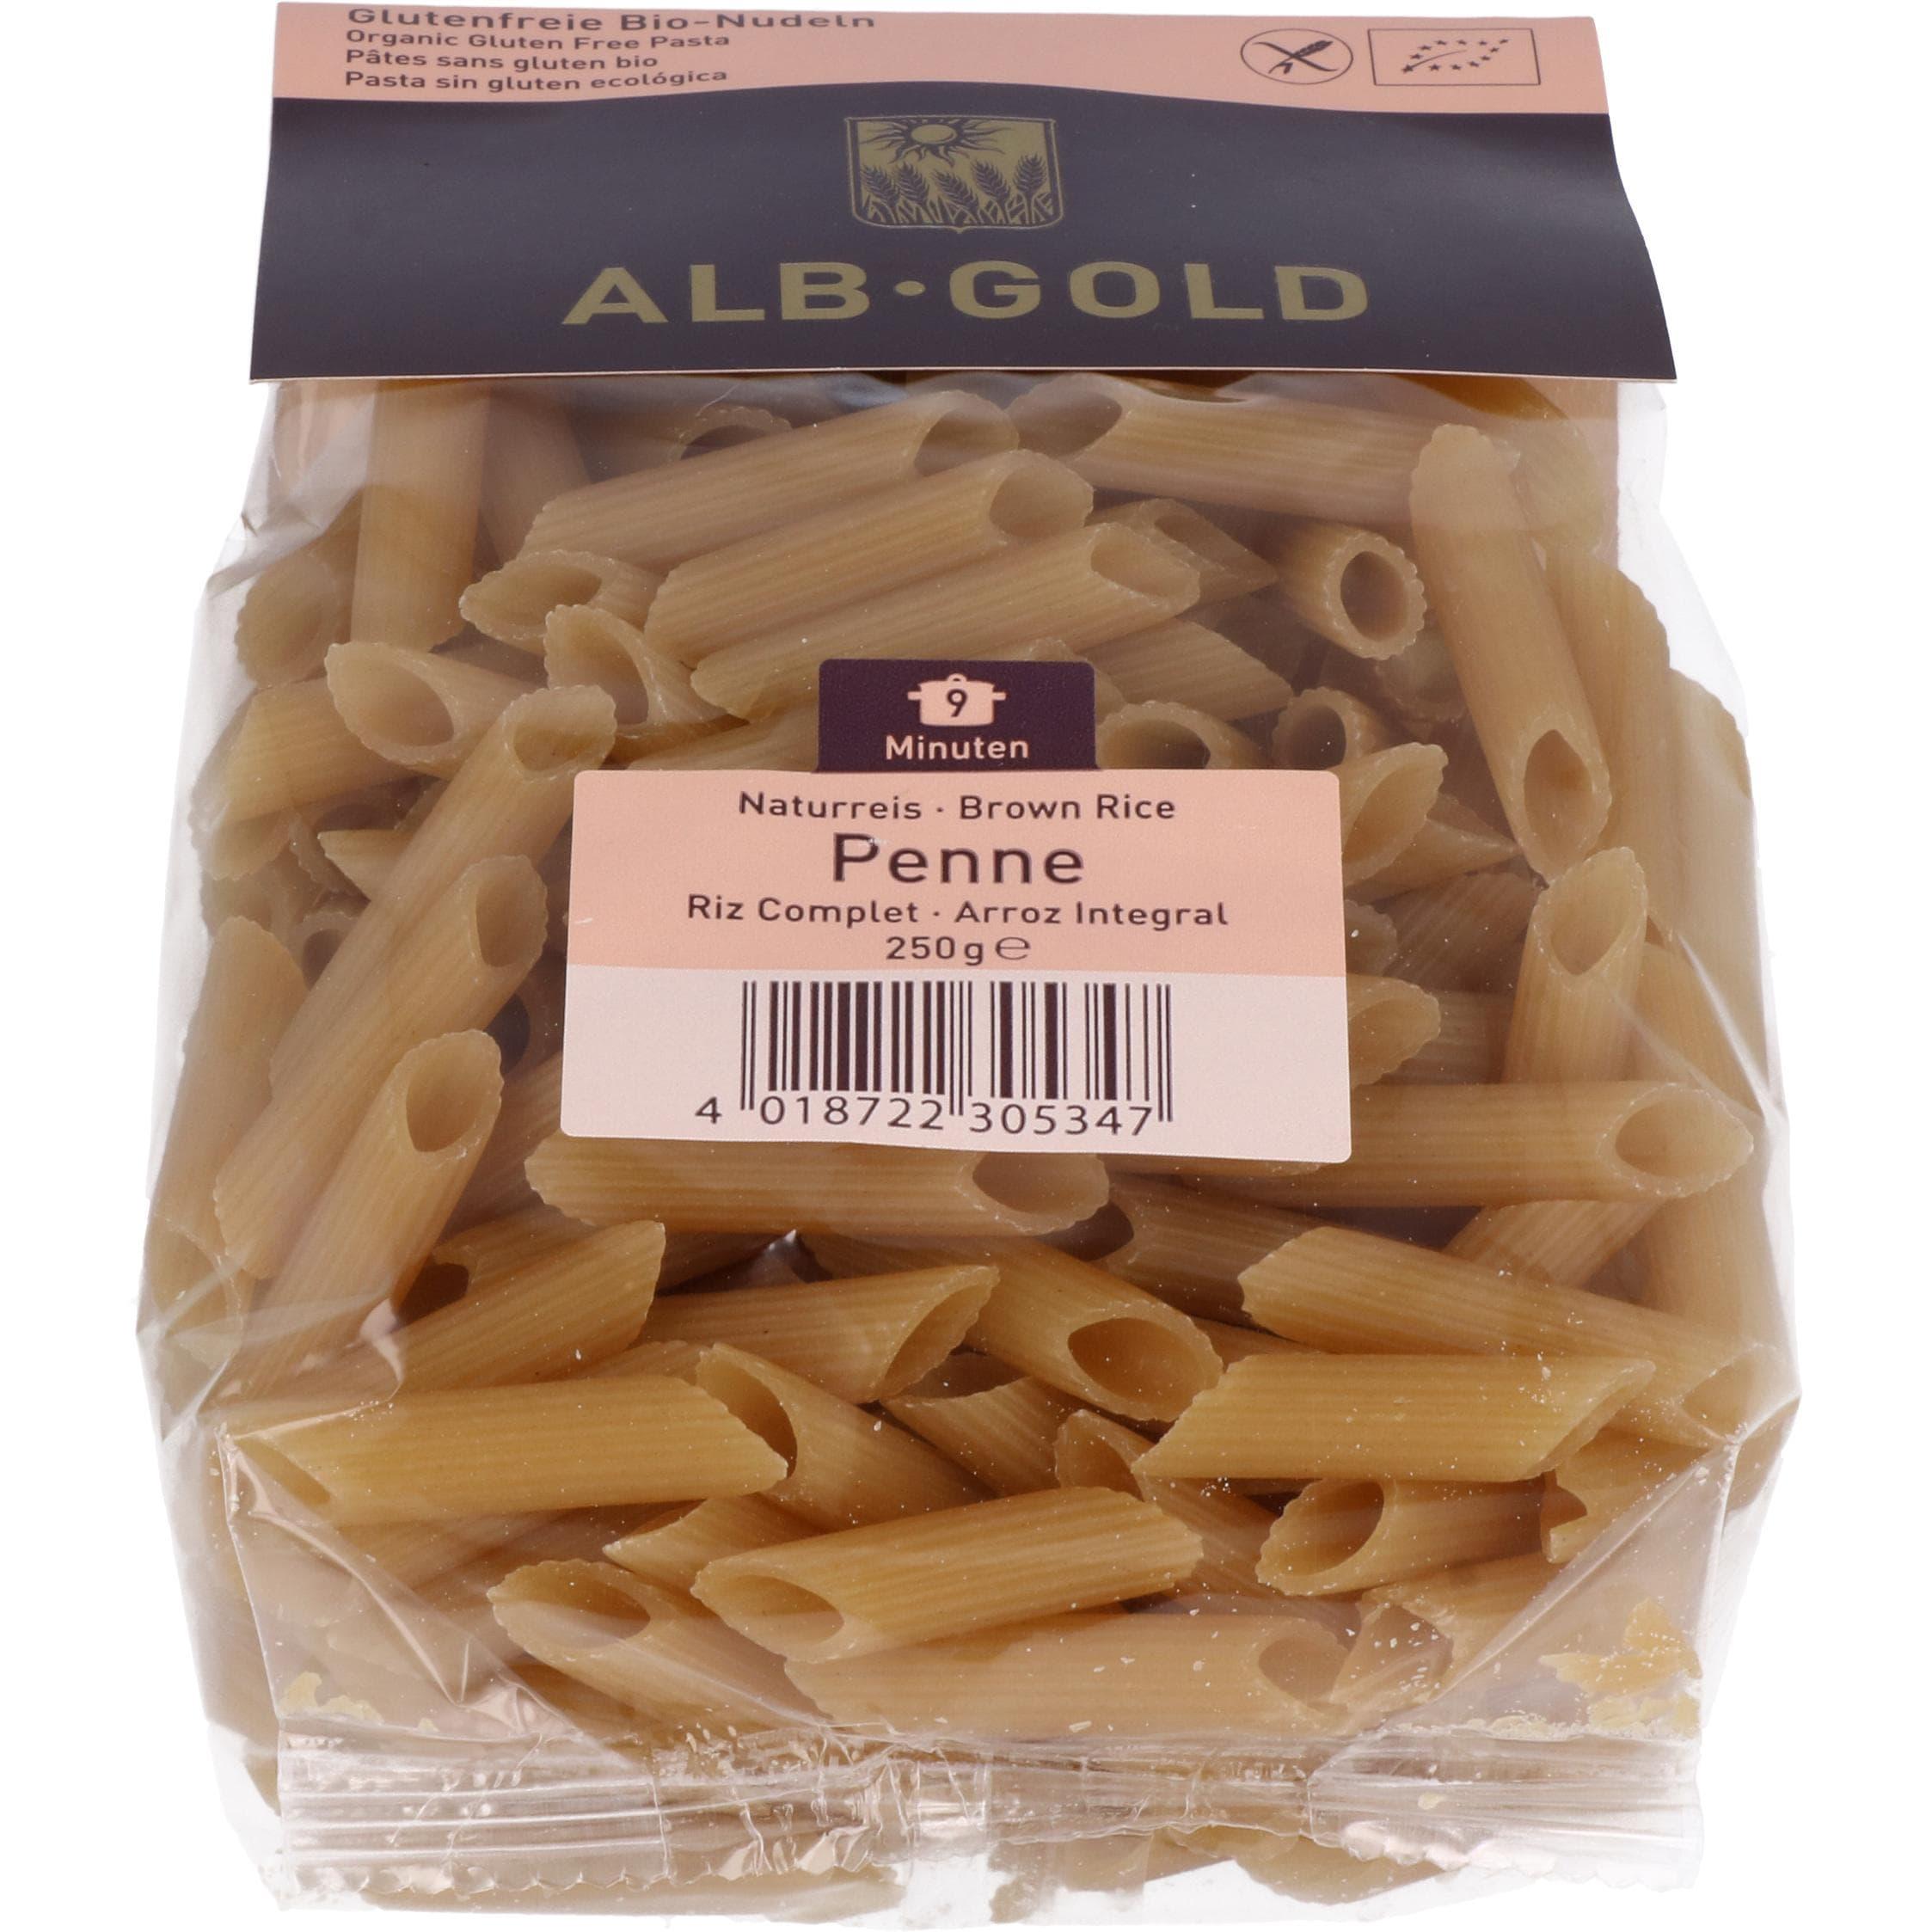 ALB-GOLD Bio Naturreis Penne 250g